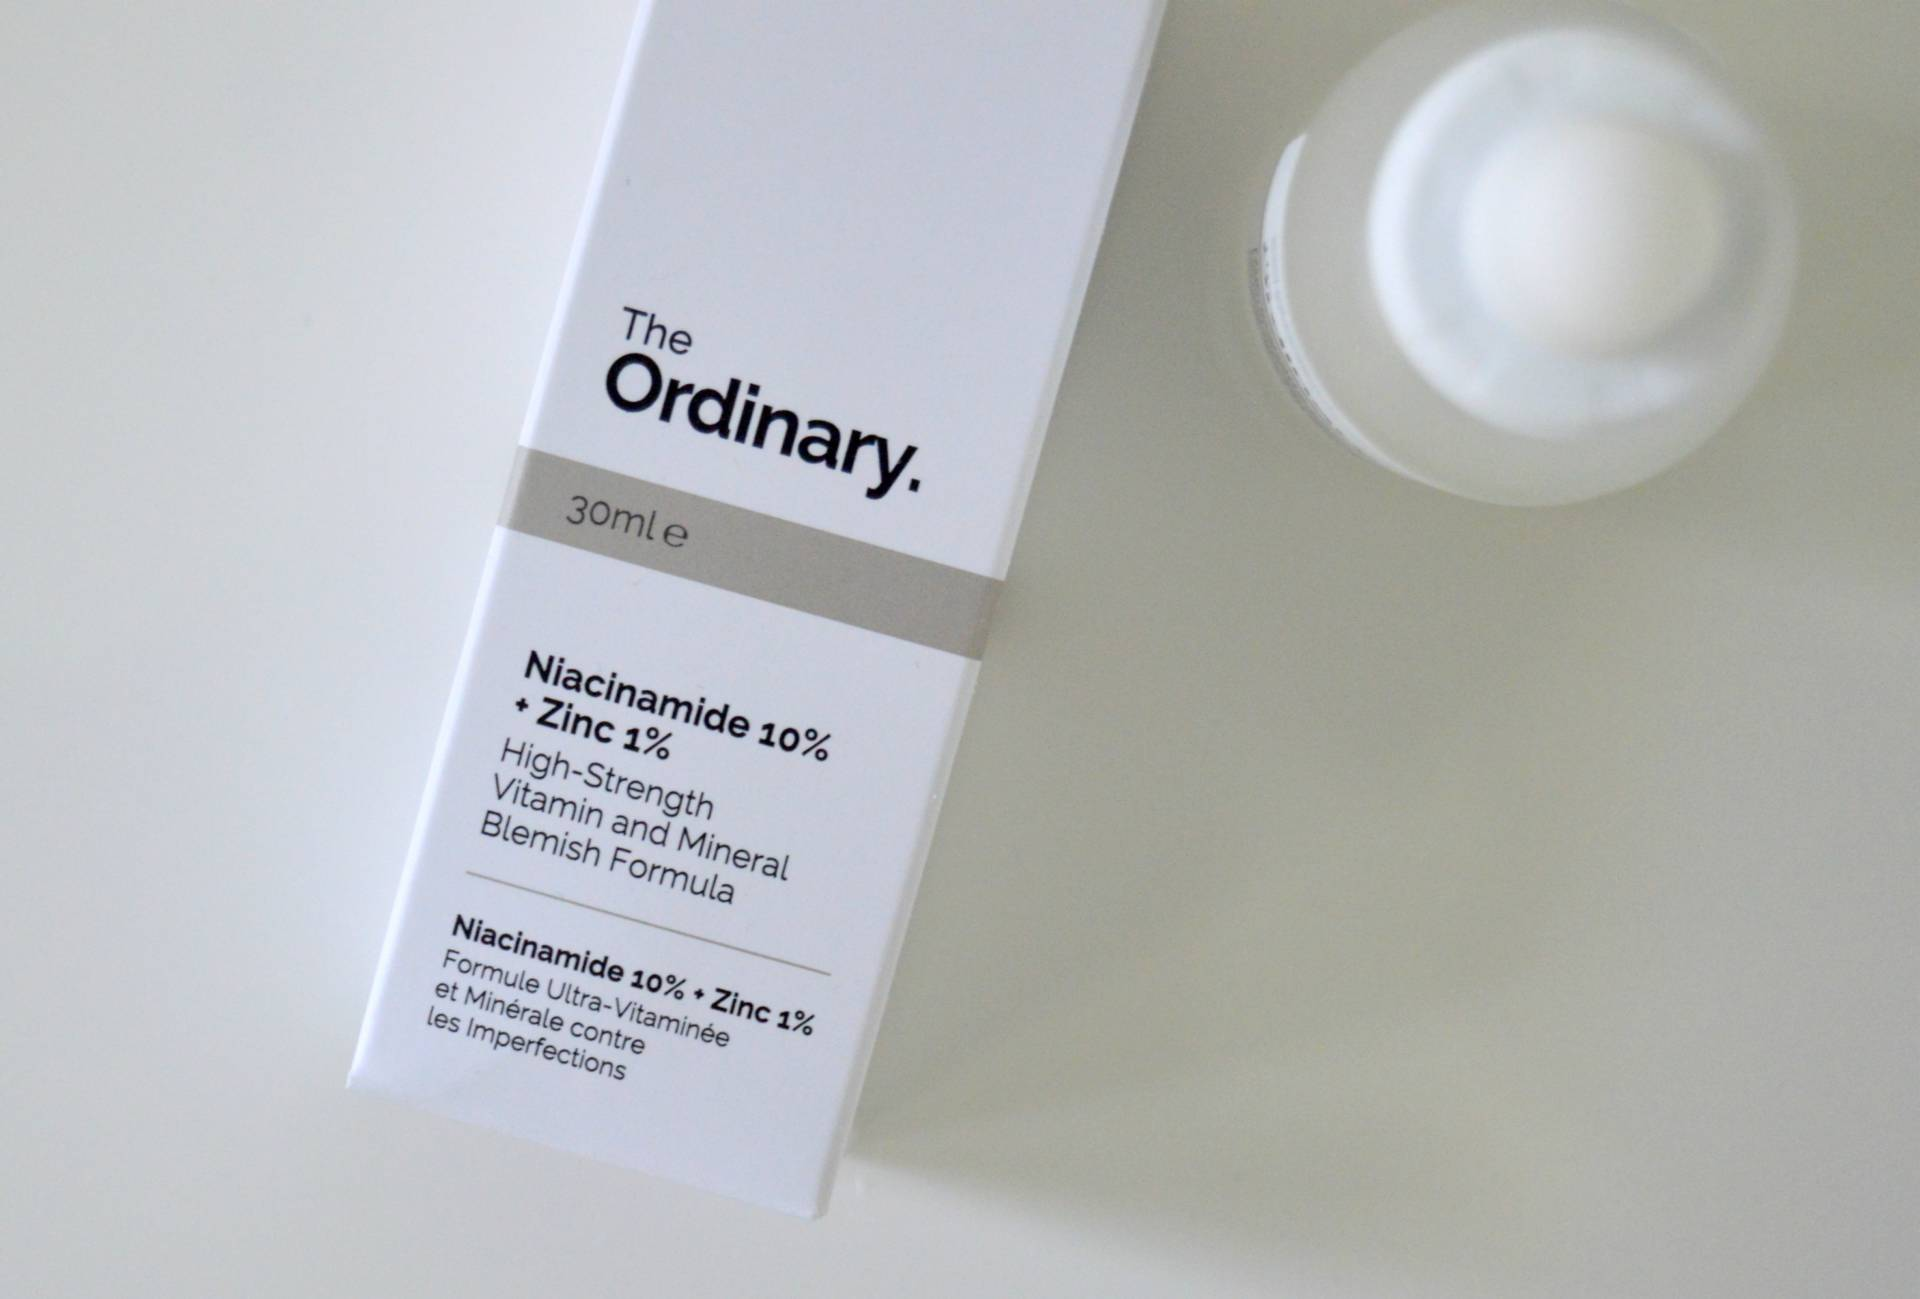 the-ordinary-serum-niacinamide-zinc-inhautepursuit-review